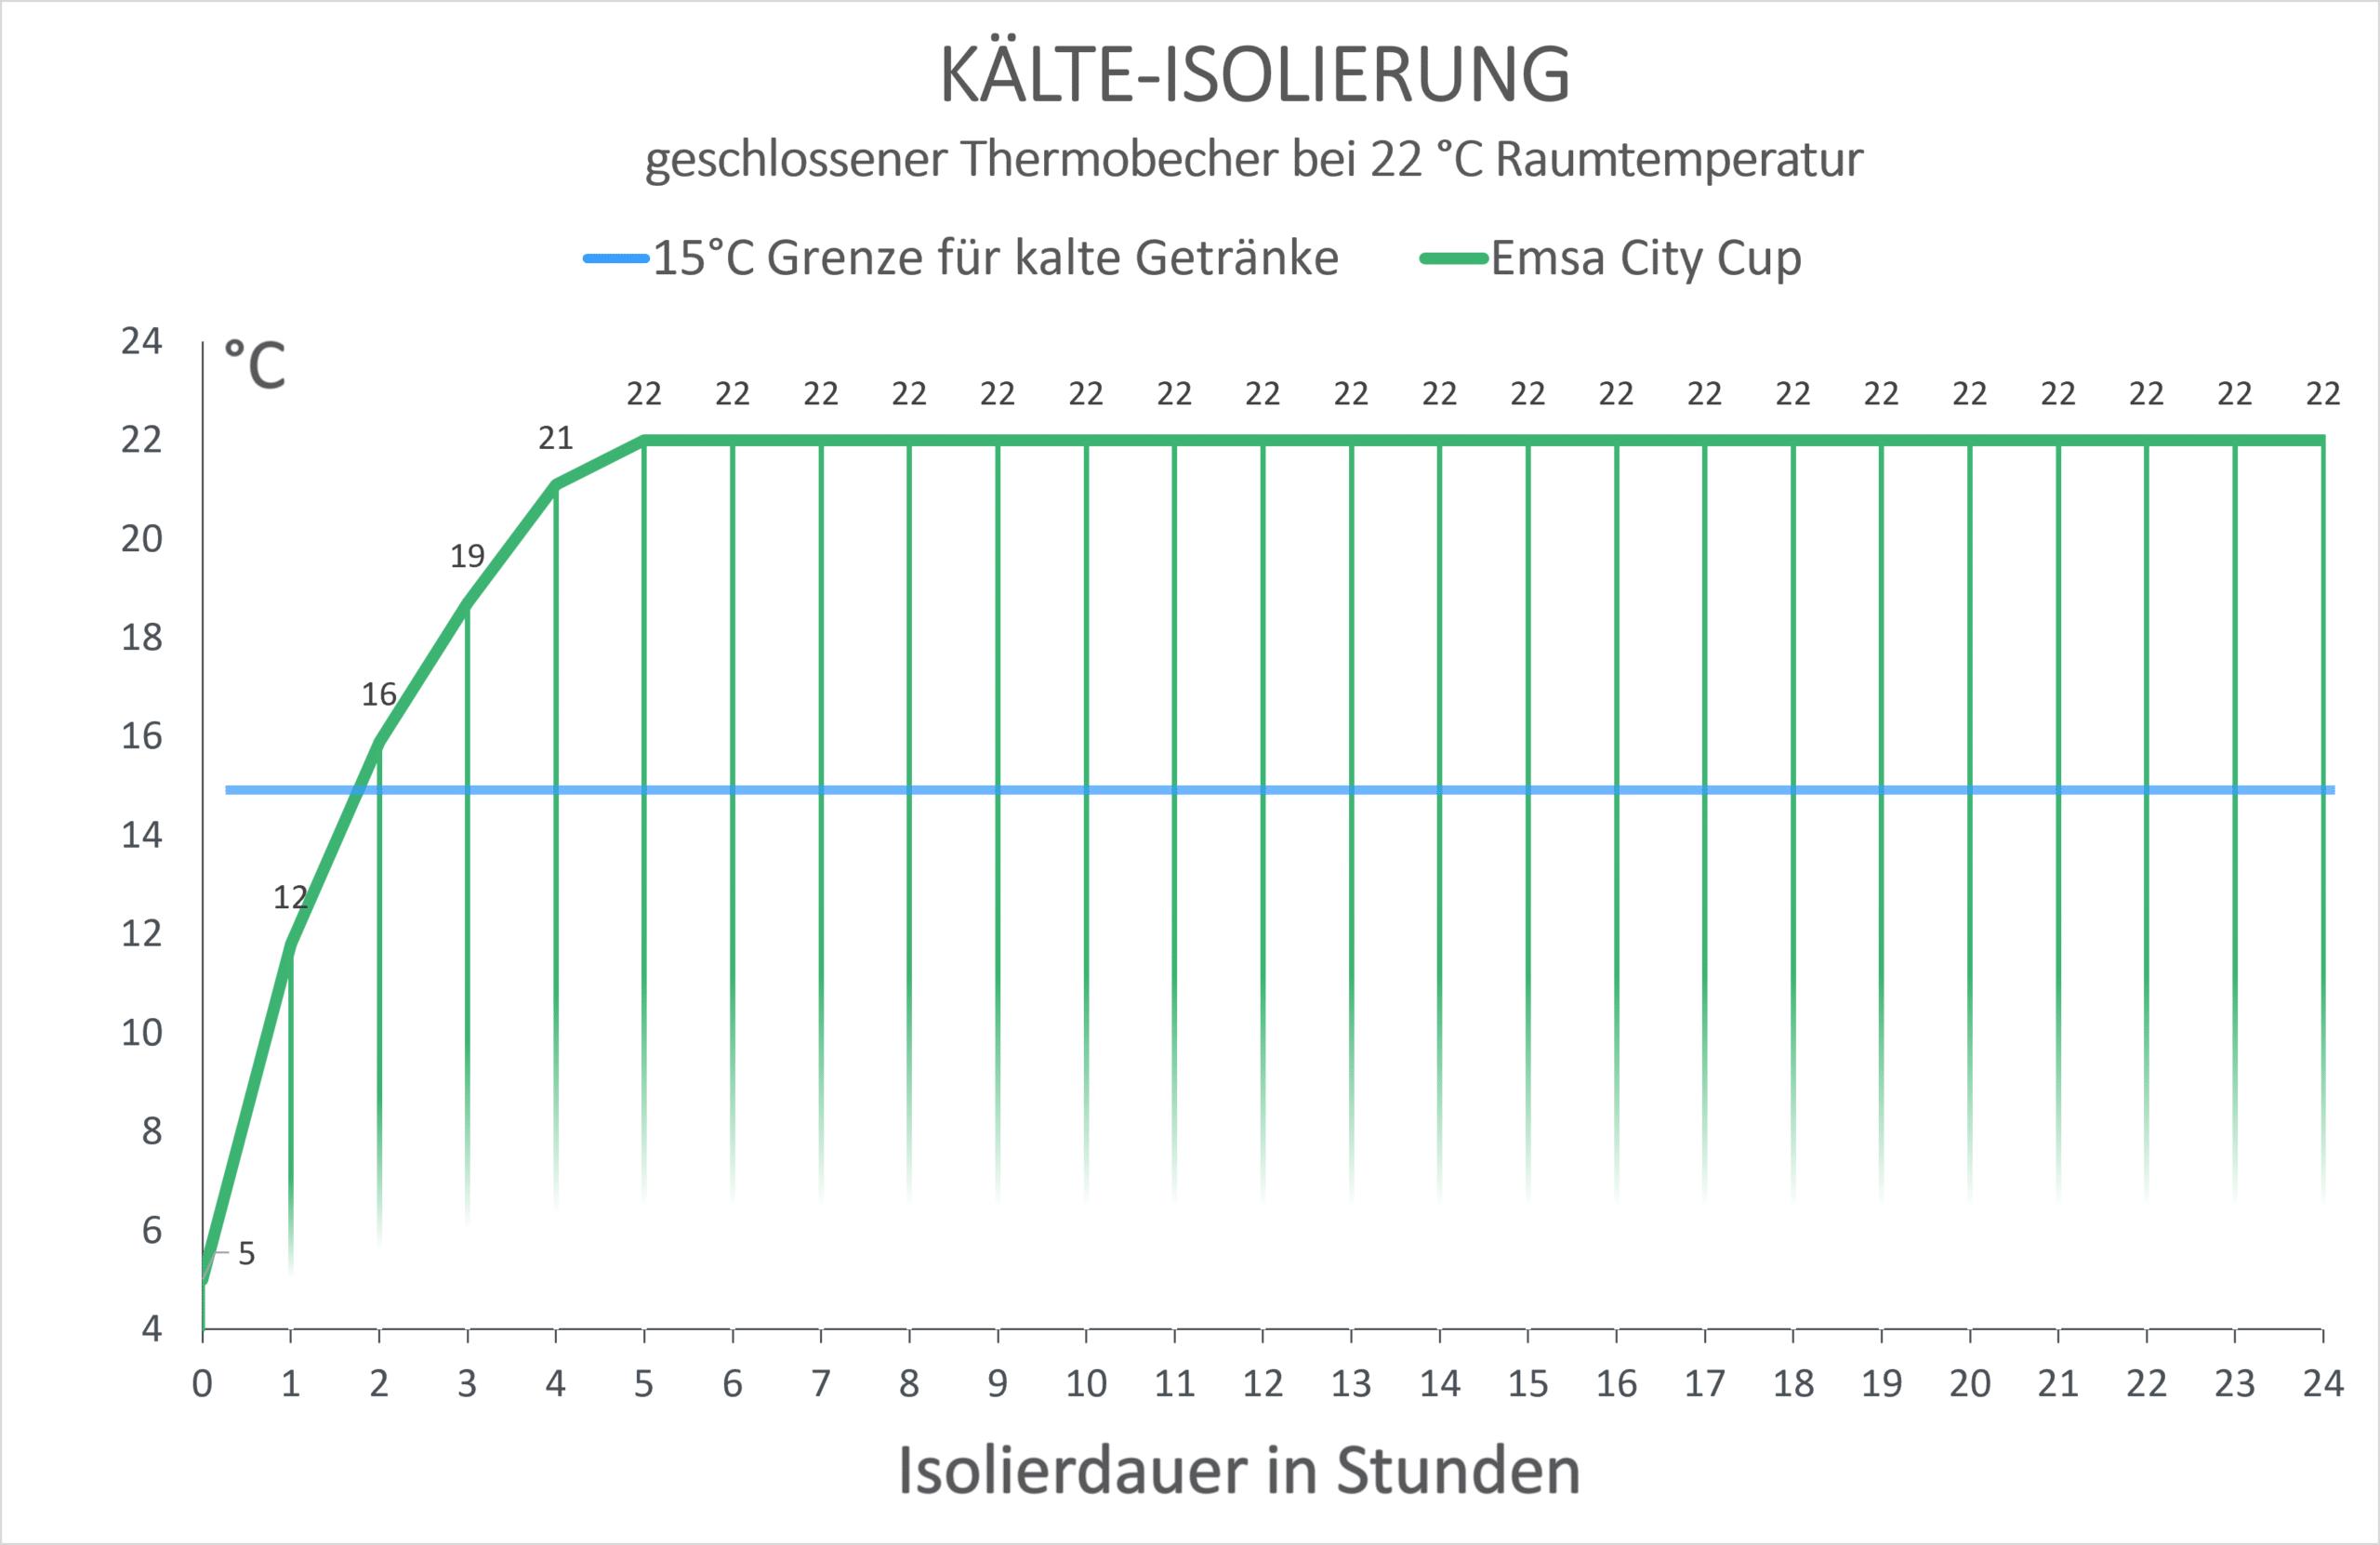 Emsa City Cup Kälte-Isolierung Diagramm